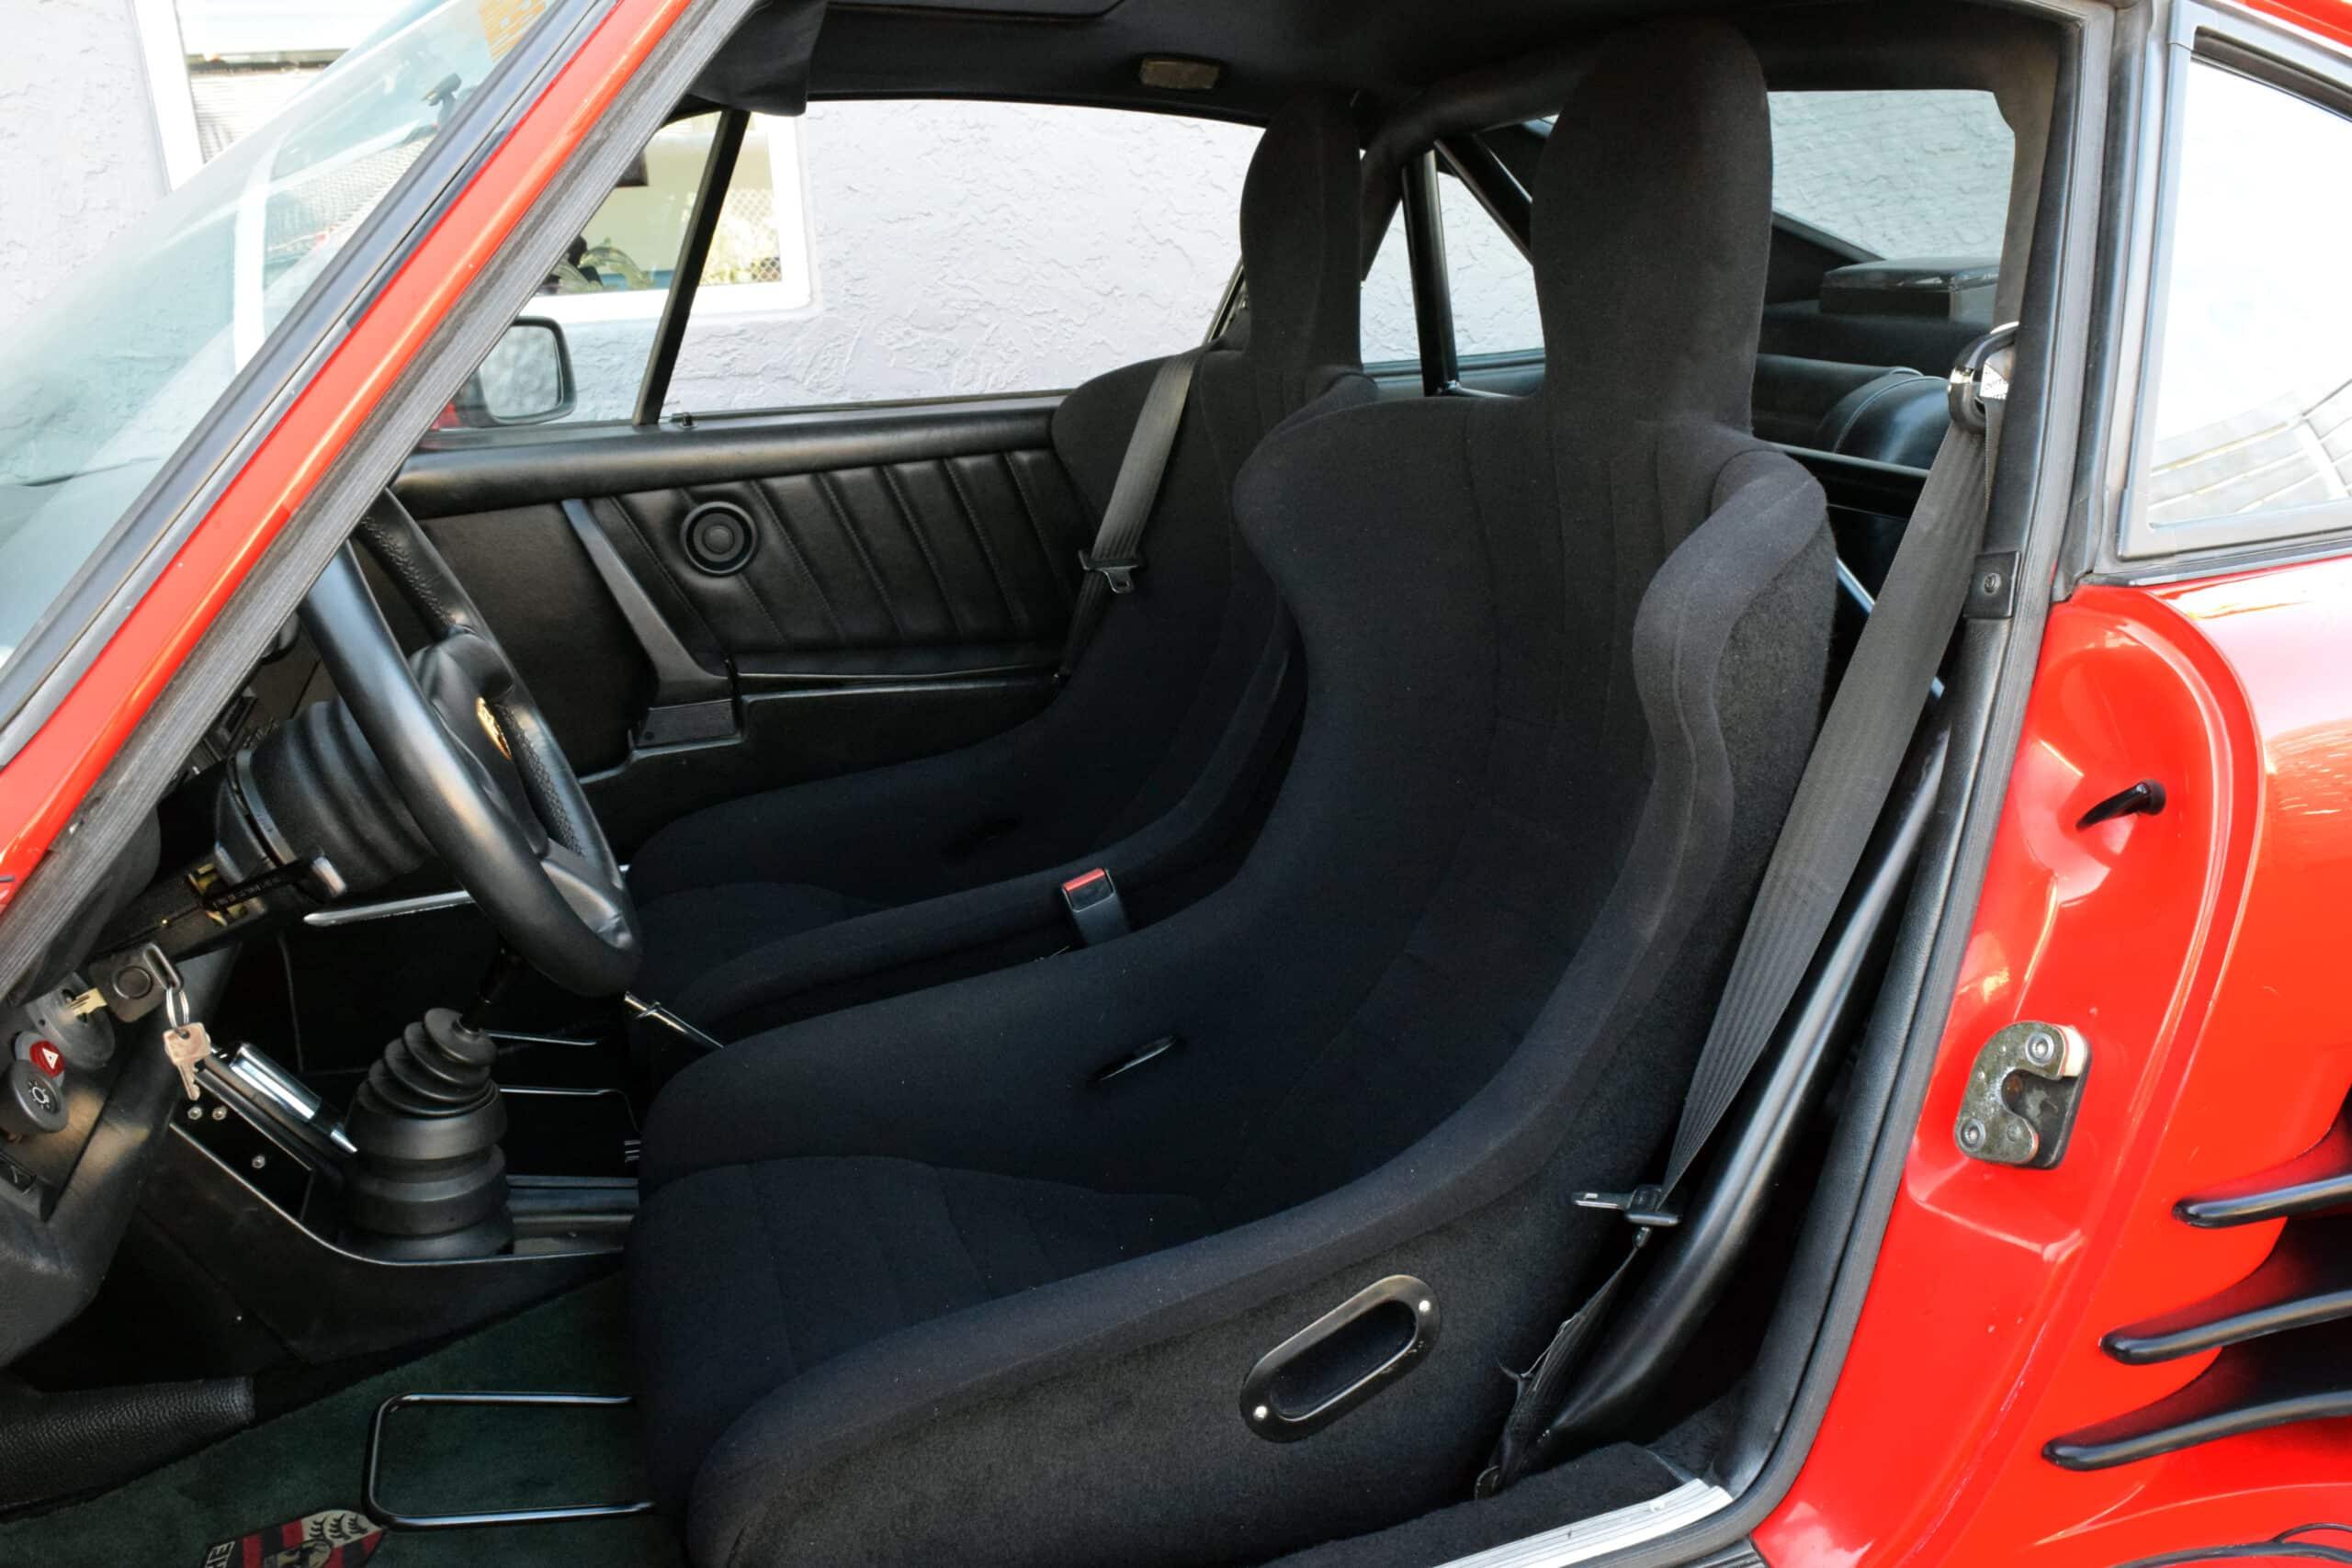 1984 911 Turbo (930) Kremer, real deal #046 3.5-liter engine, NACA ducts, Compomotive wheels, DP/935 Lollipop seats, Matter Cage